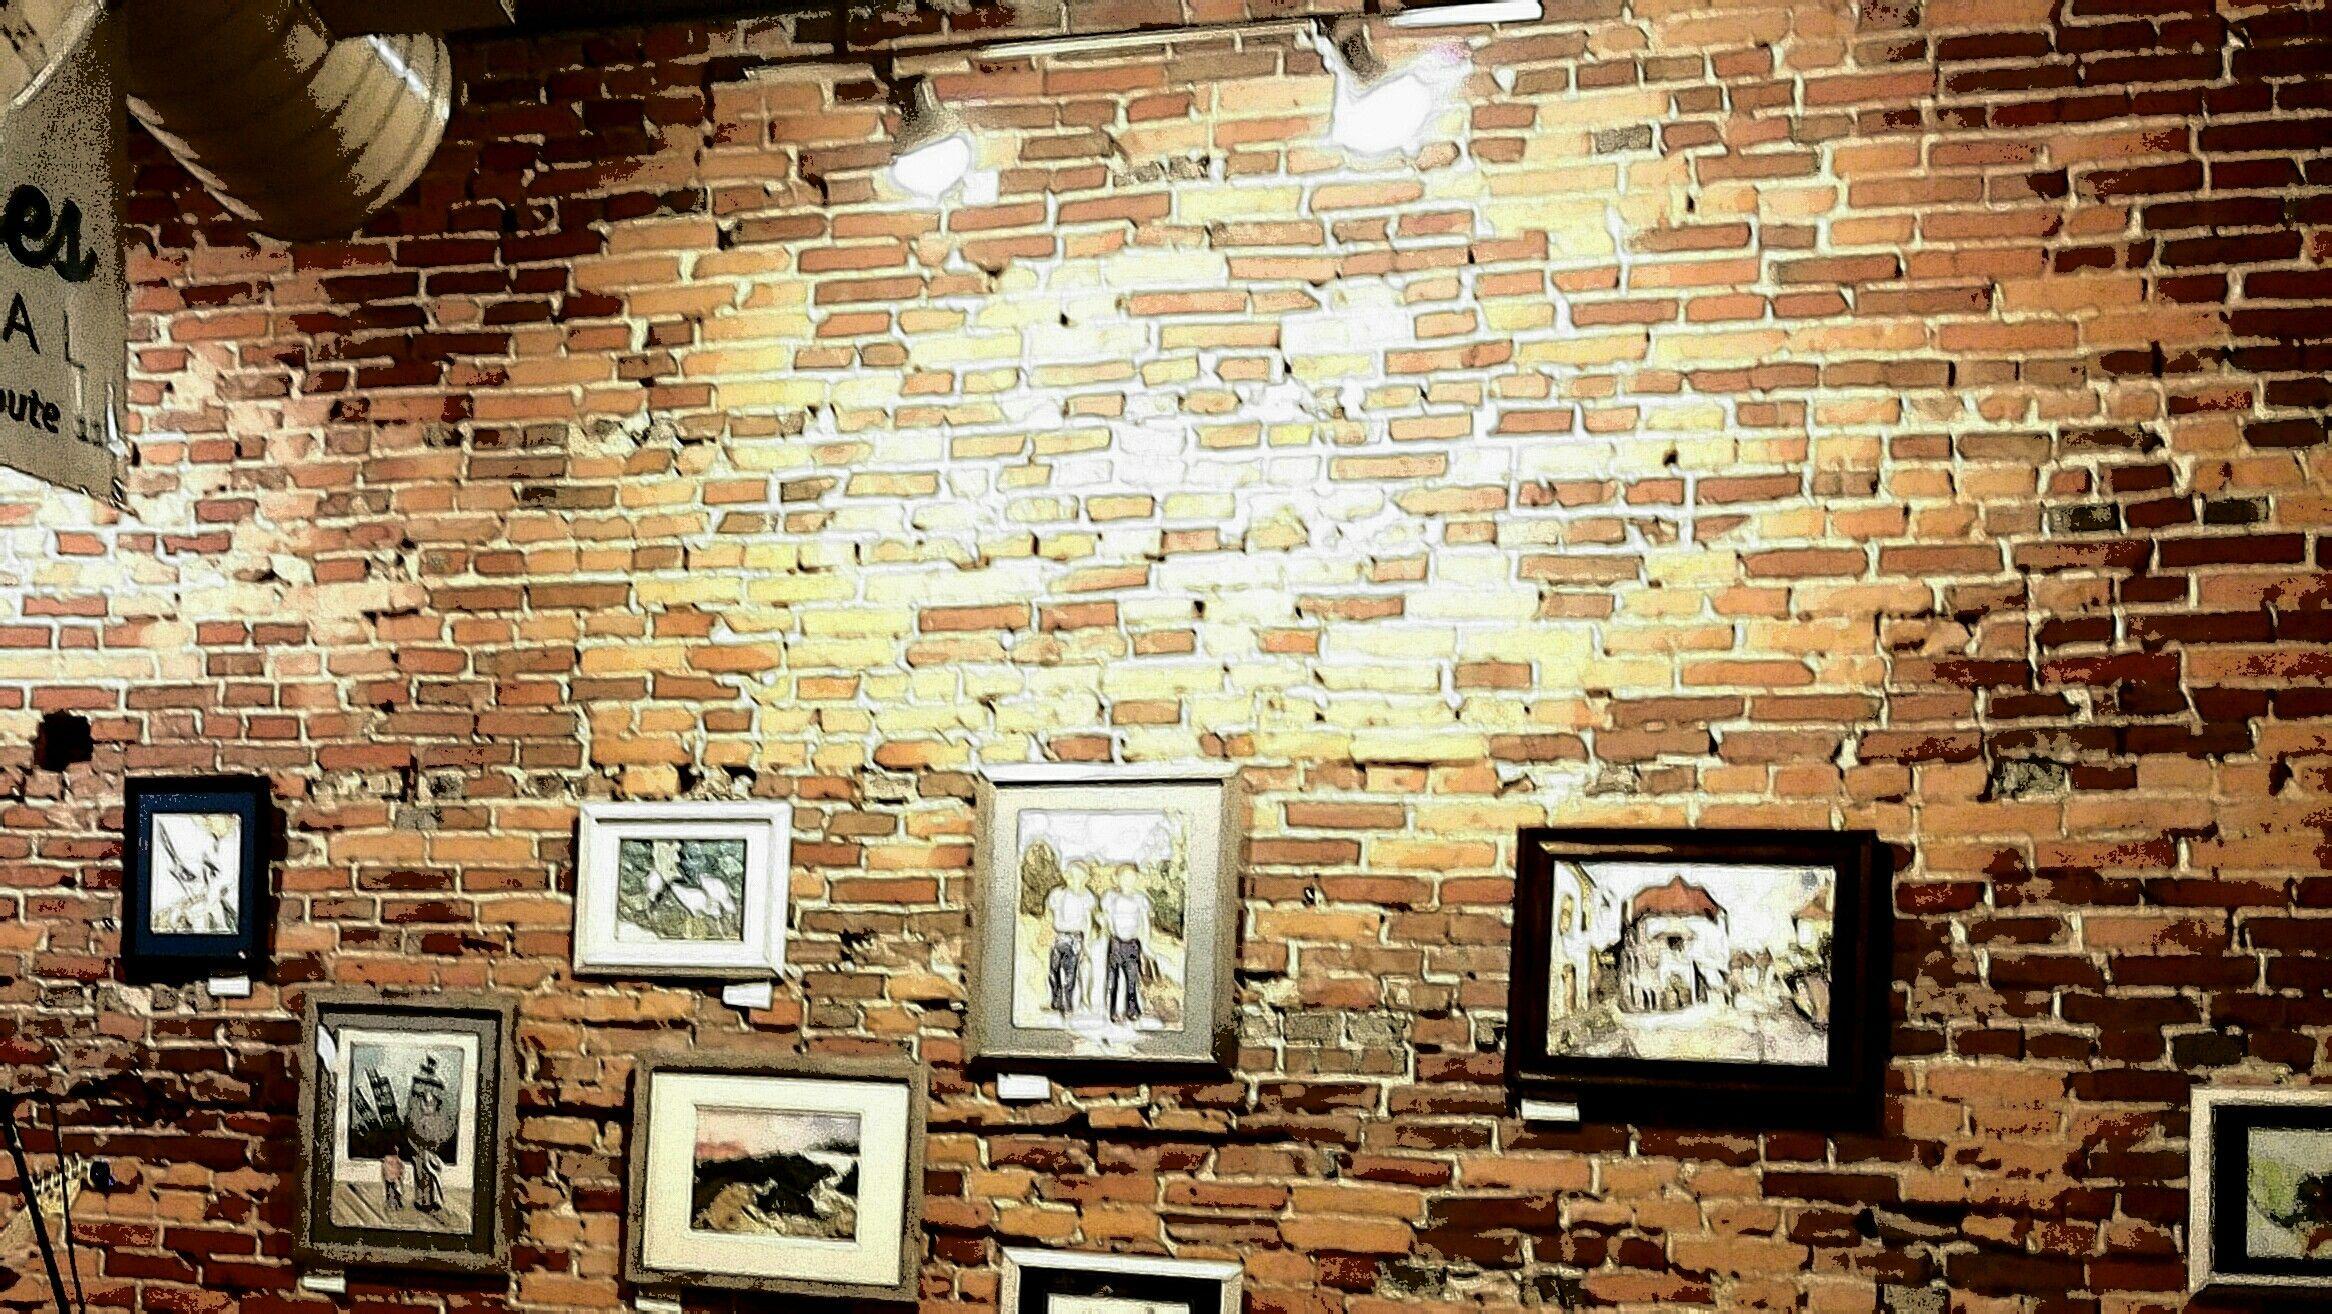 Rustic Brick Wall | RUSTIC & RUFFLED | Pinterest | Bricks and Walls